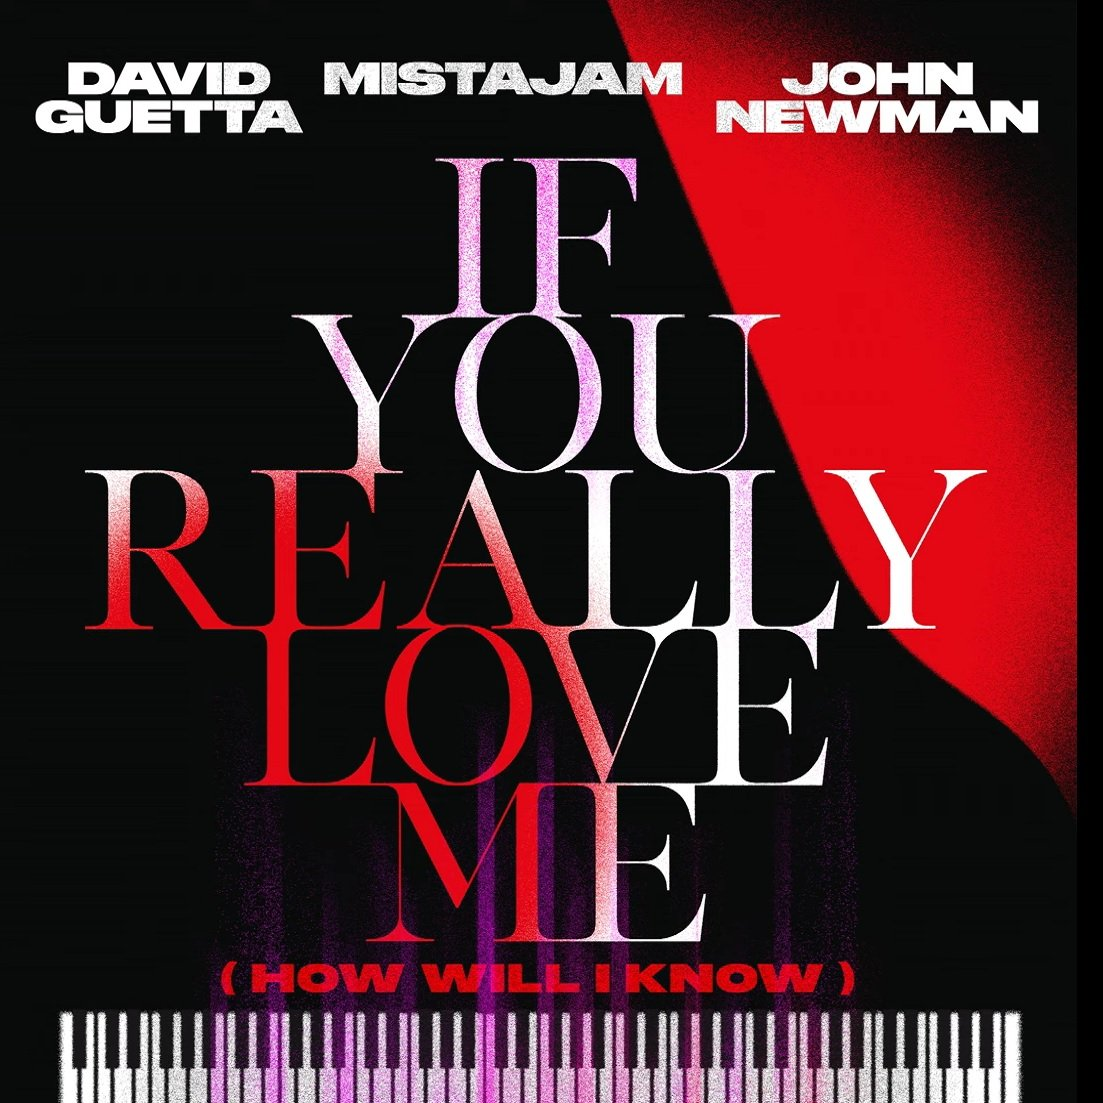 David Guetta x MistaJam x John Newman If You Really Love Me